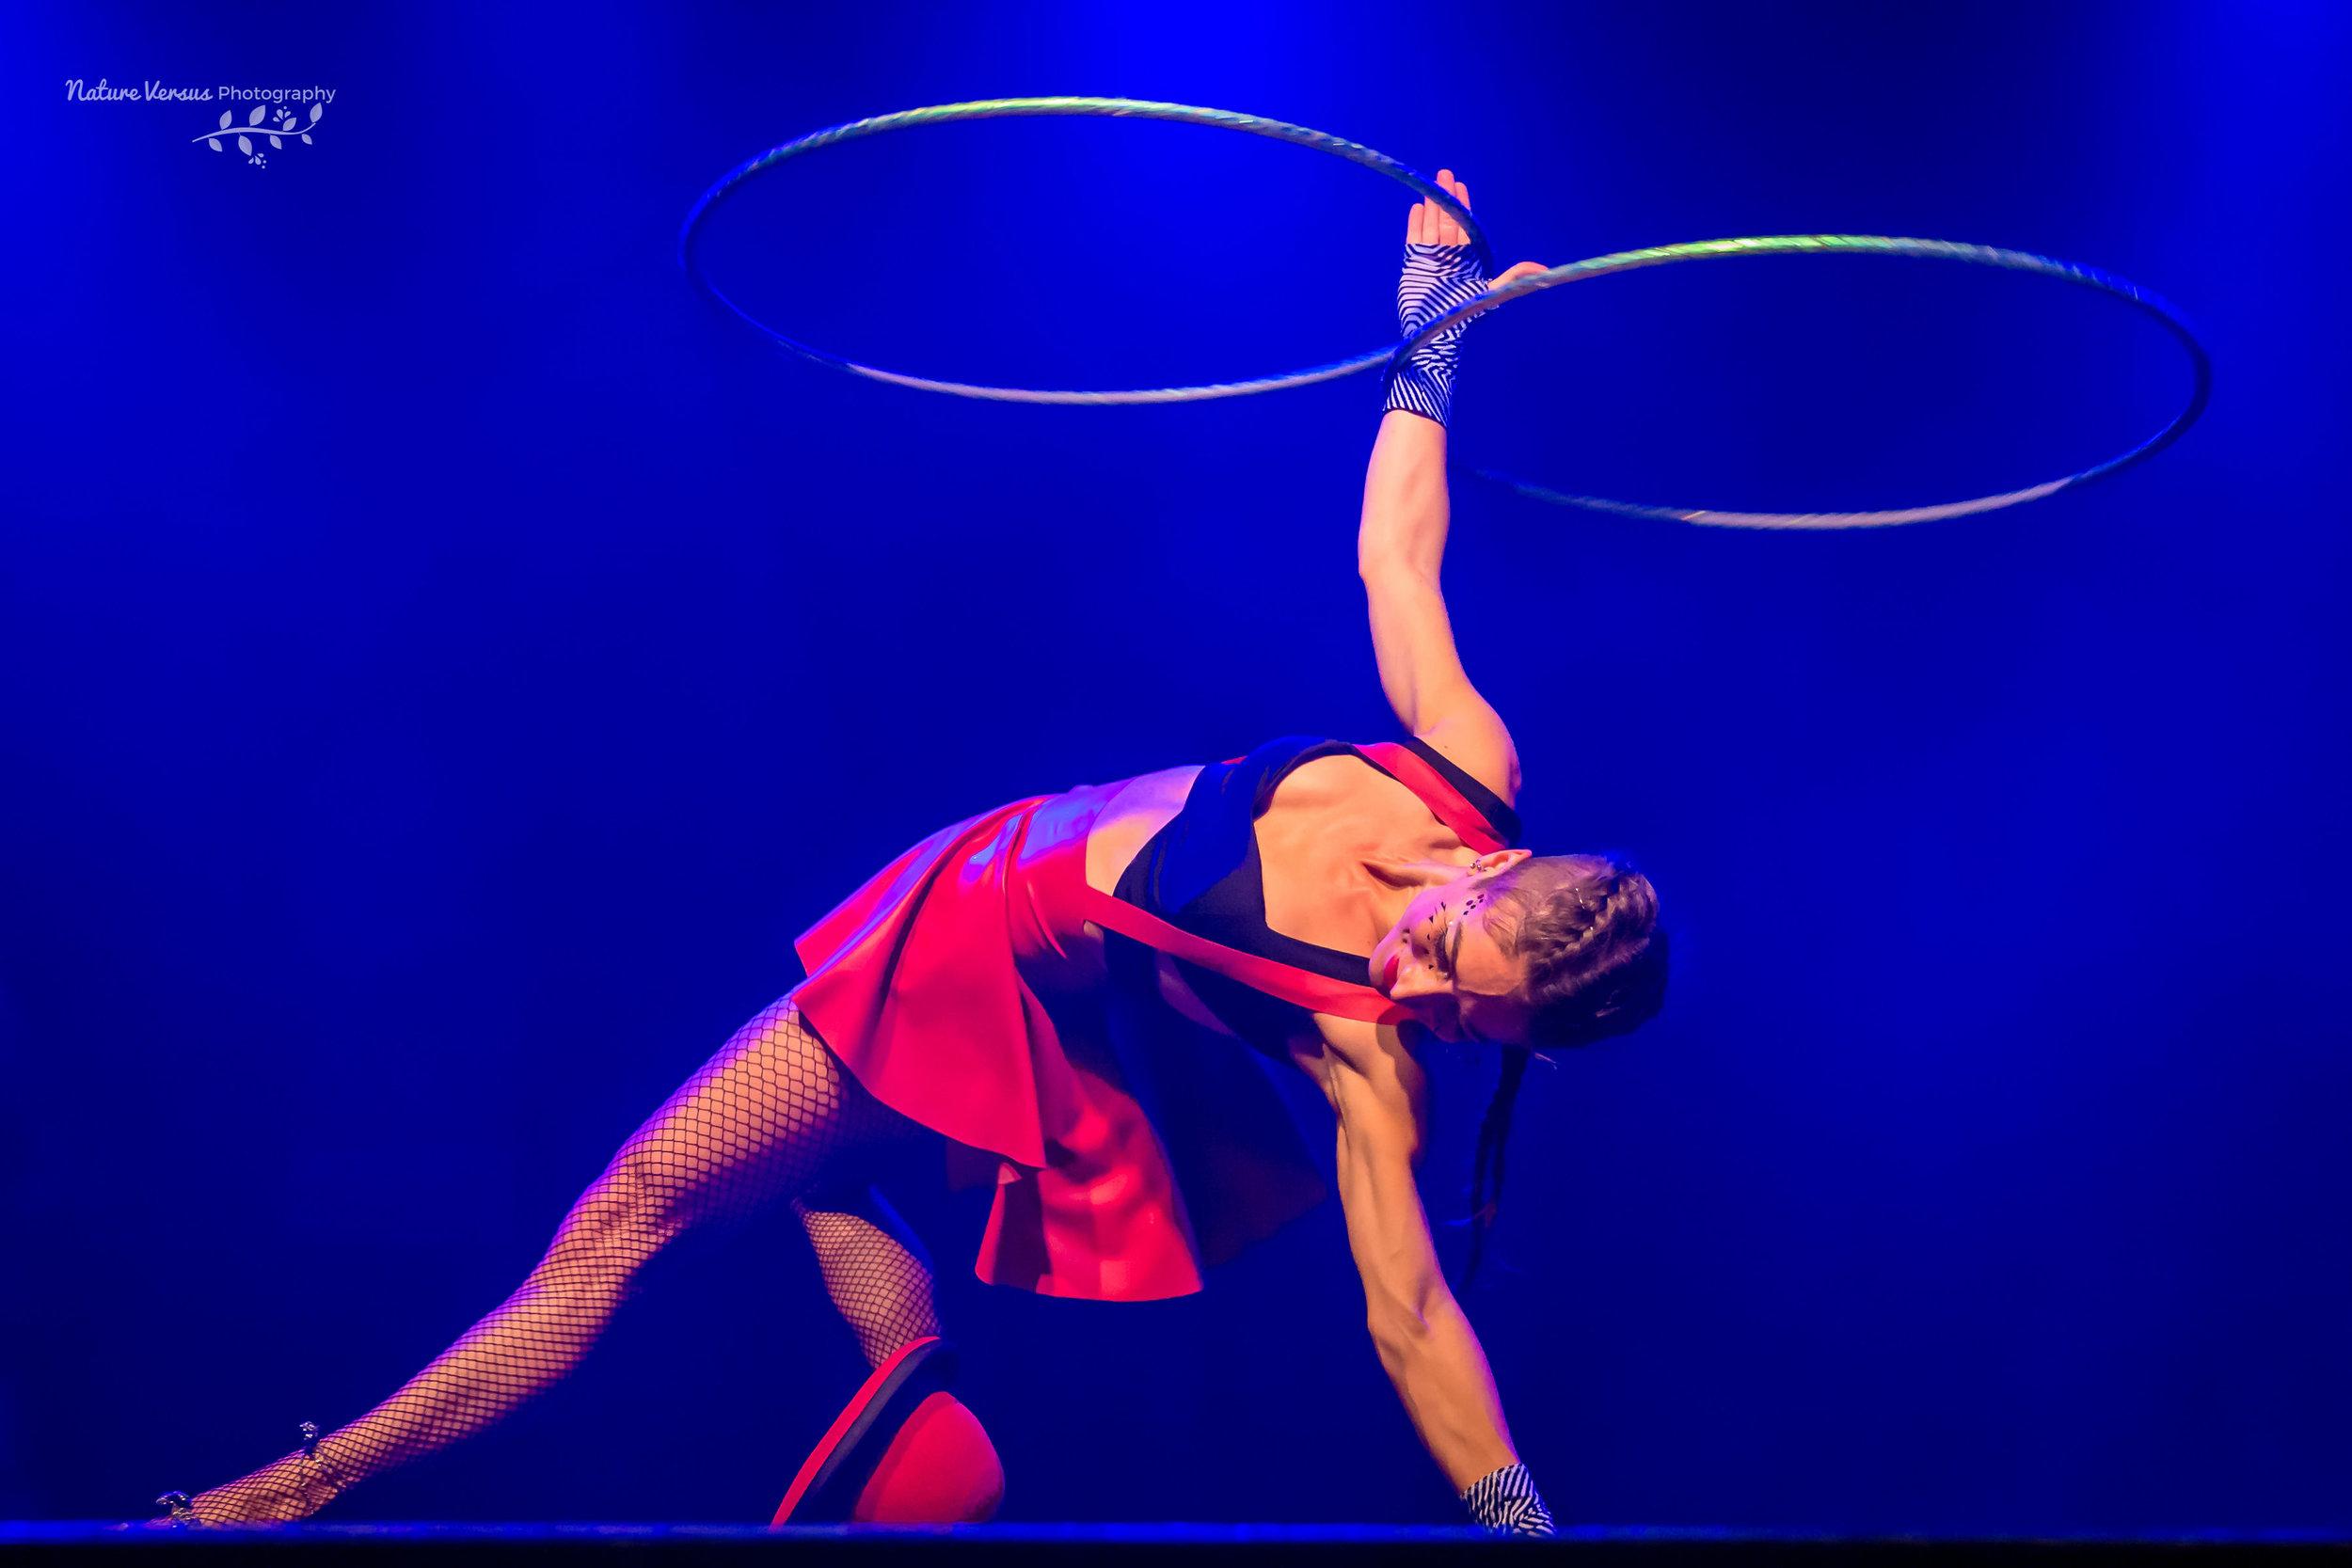 cırkusakt cırkusshow nycırkus kabare kabareshow rockrıng buket rın hula hoop show cırcus cabaret hoop dance fest event underhållning föreställning